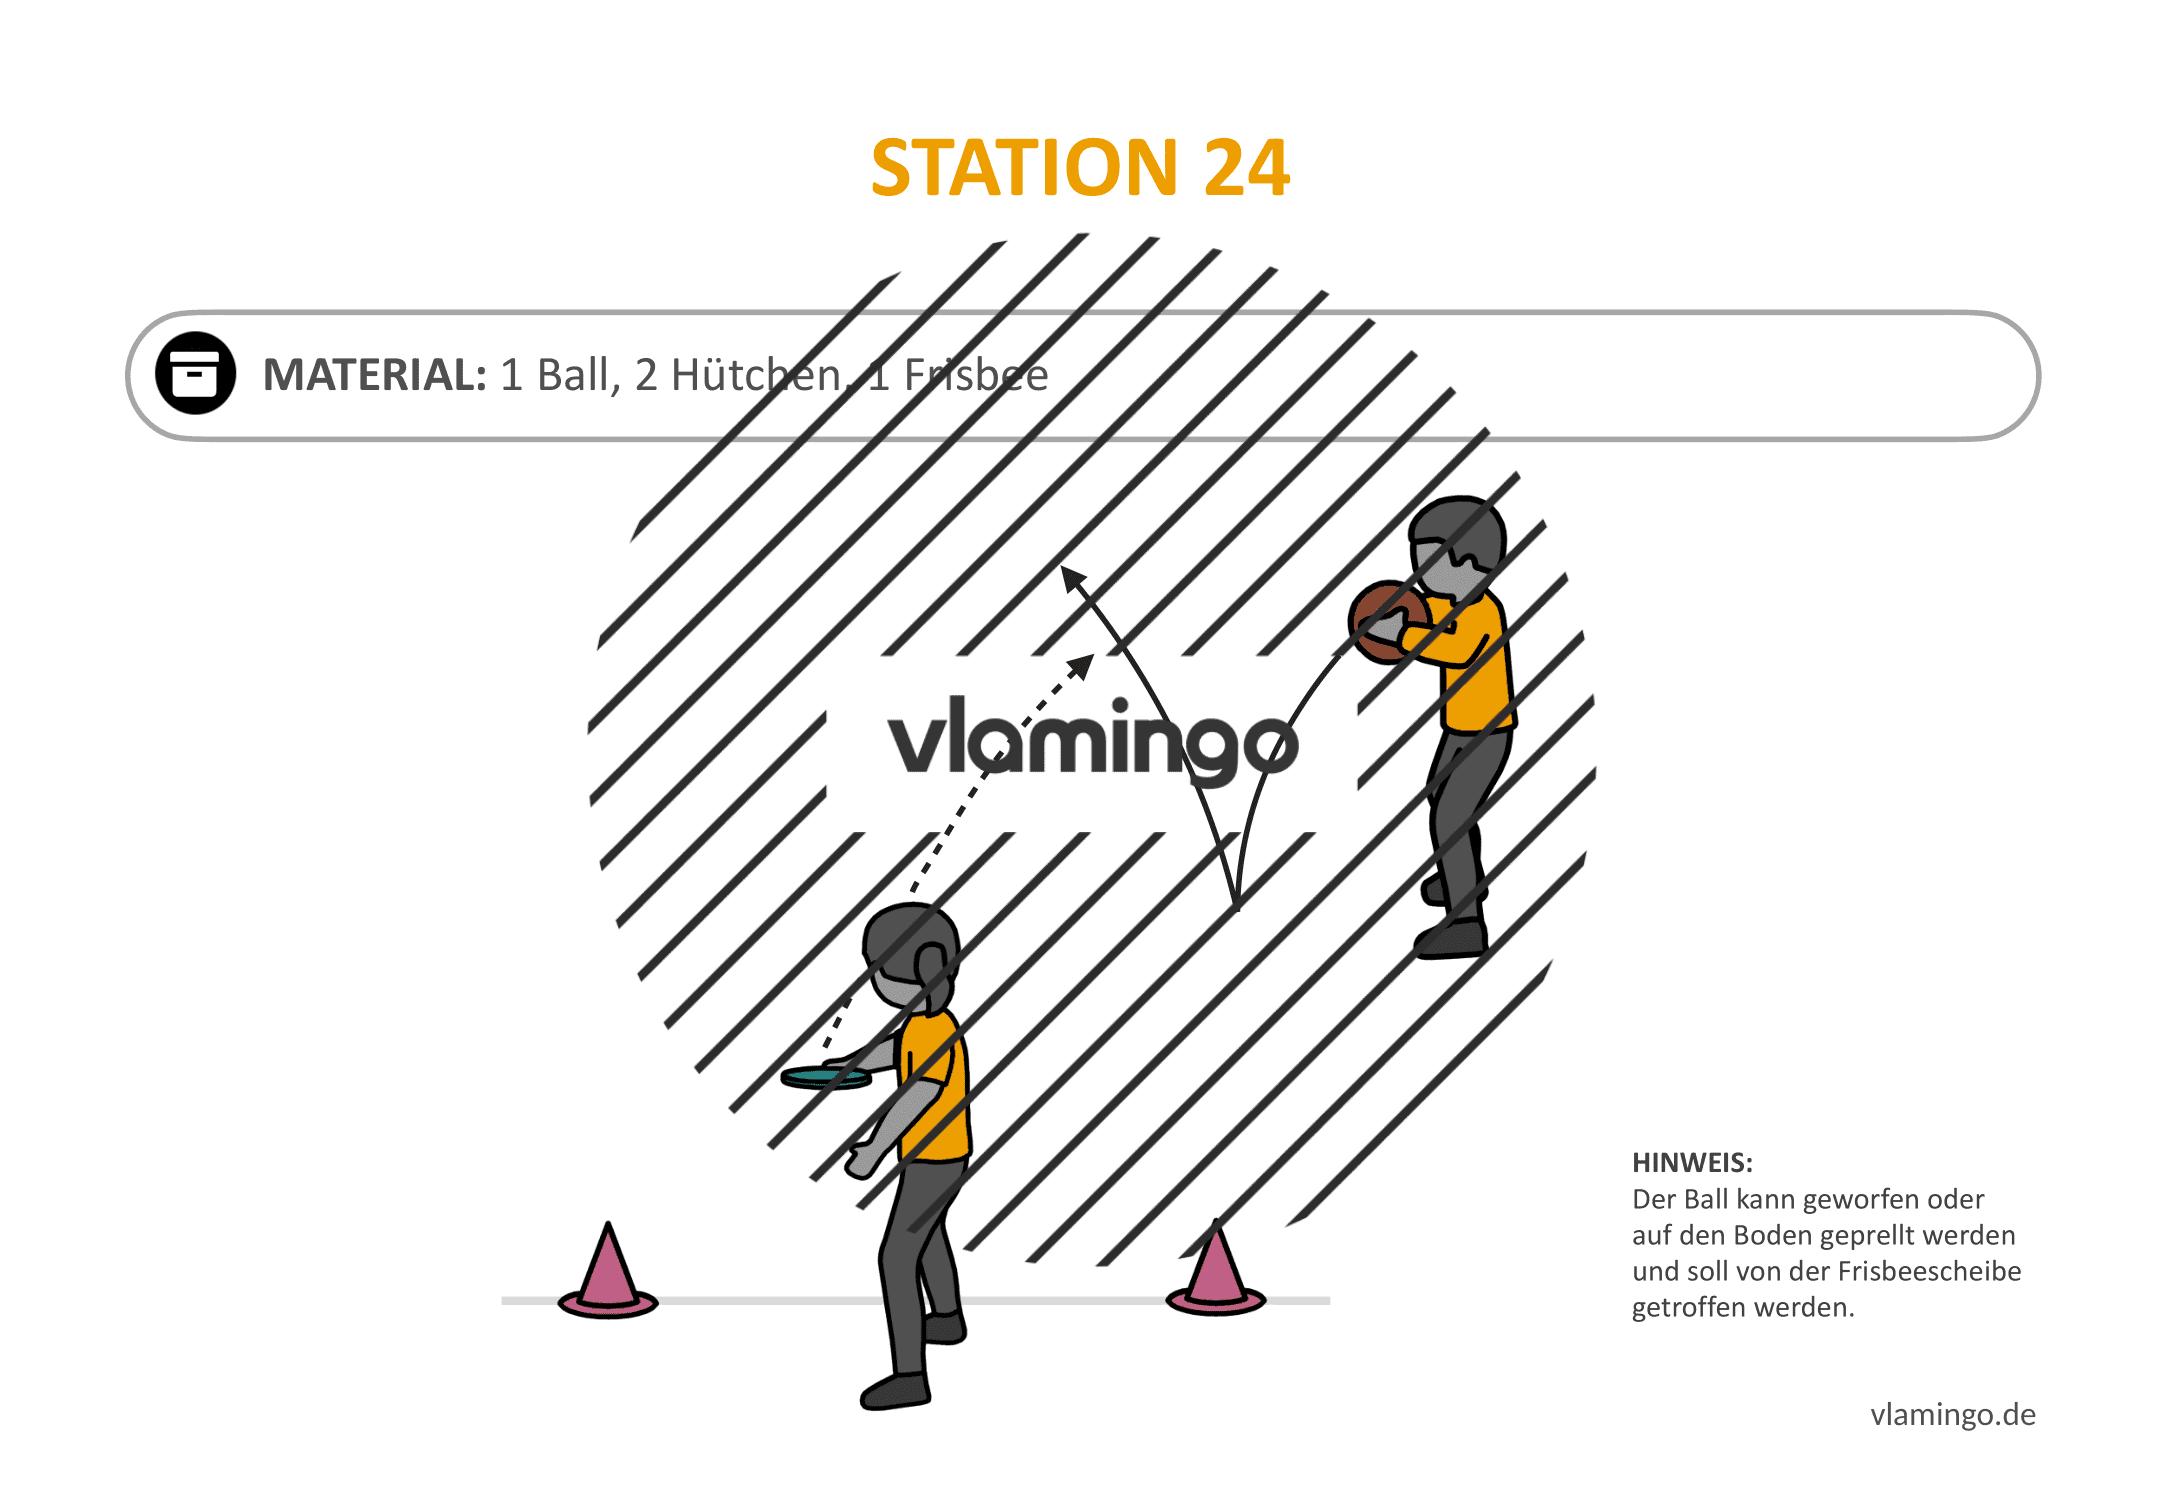 Frisbeegolf (Disc-Golf) - Station 24